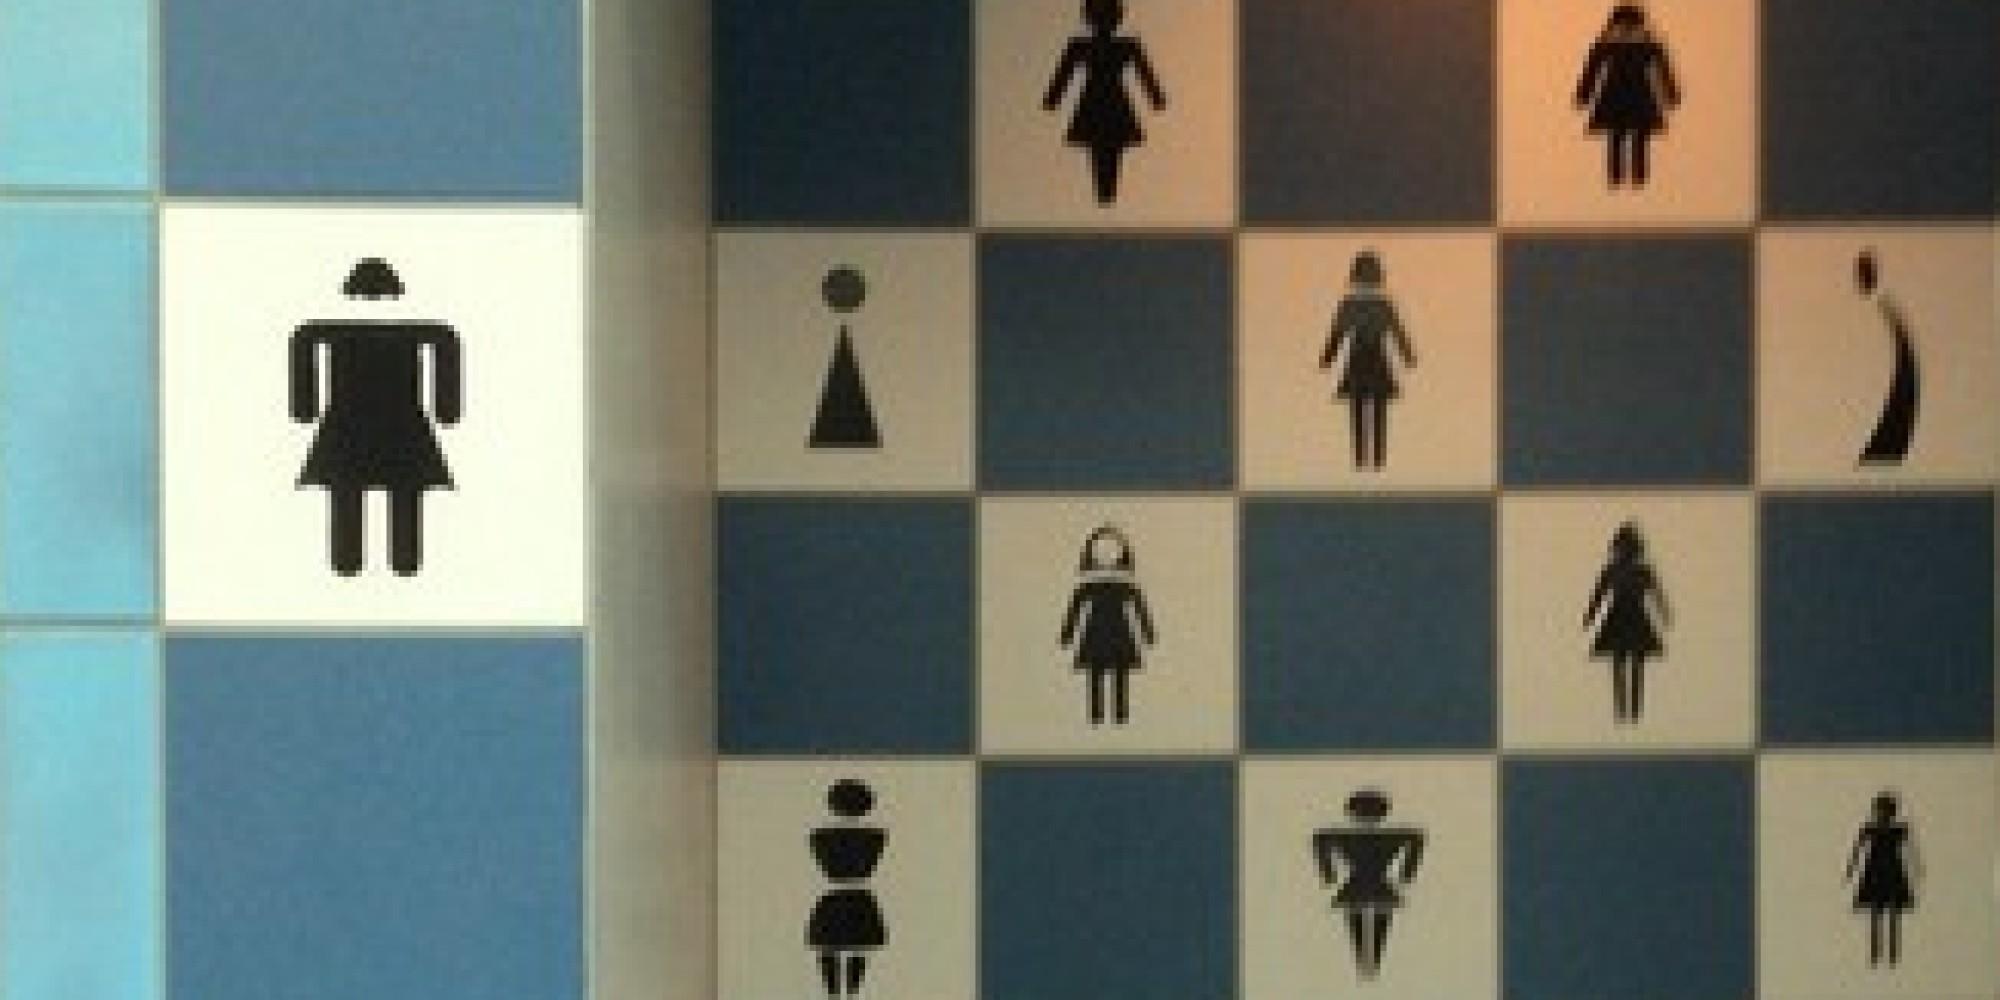 o-WOMENS-BATHROOM-SIGN-